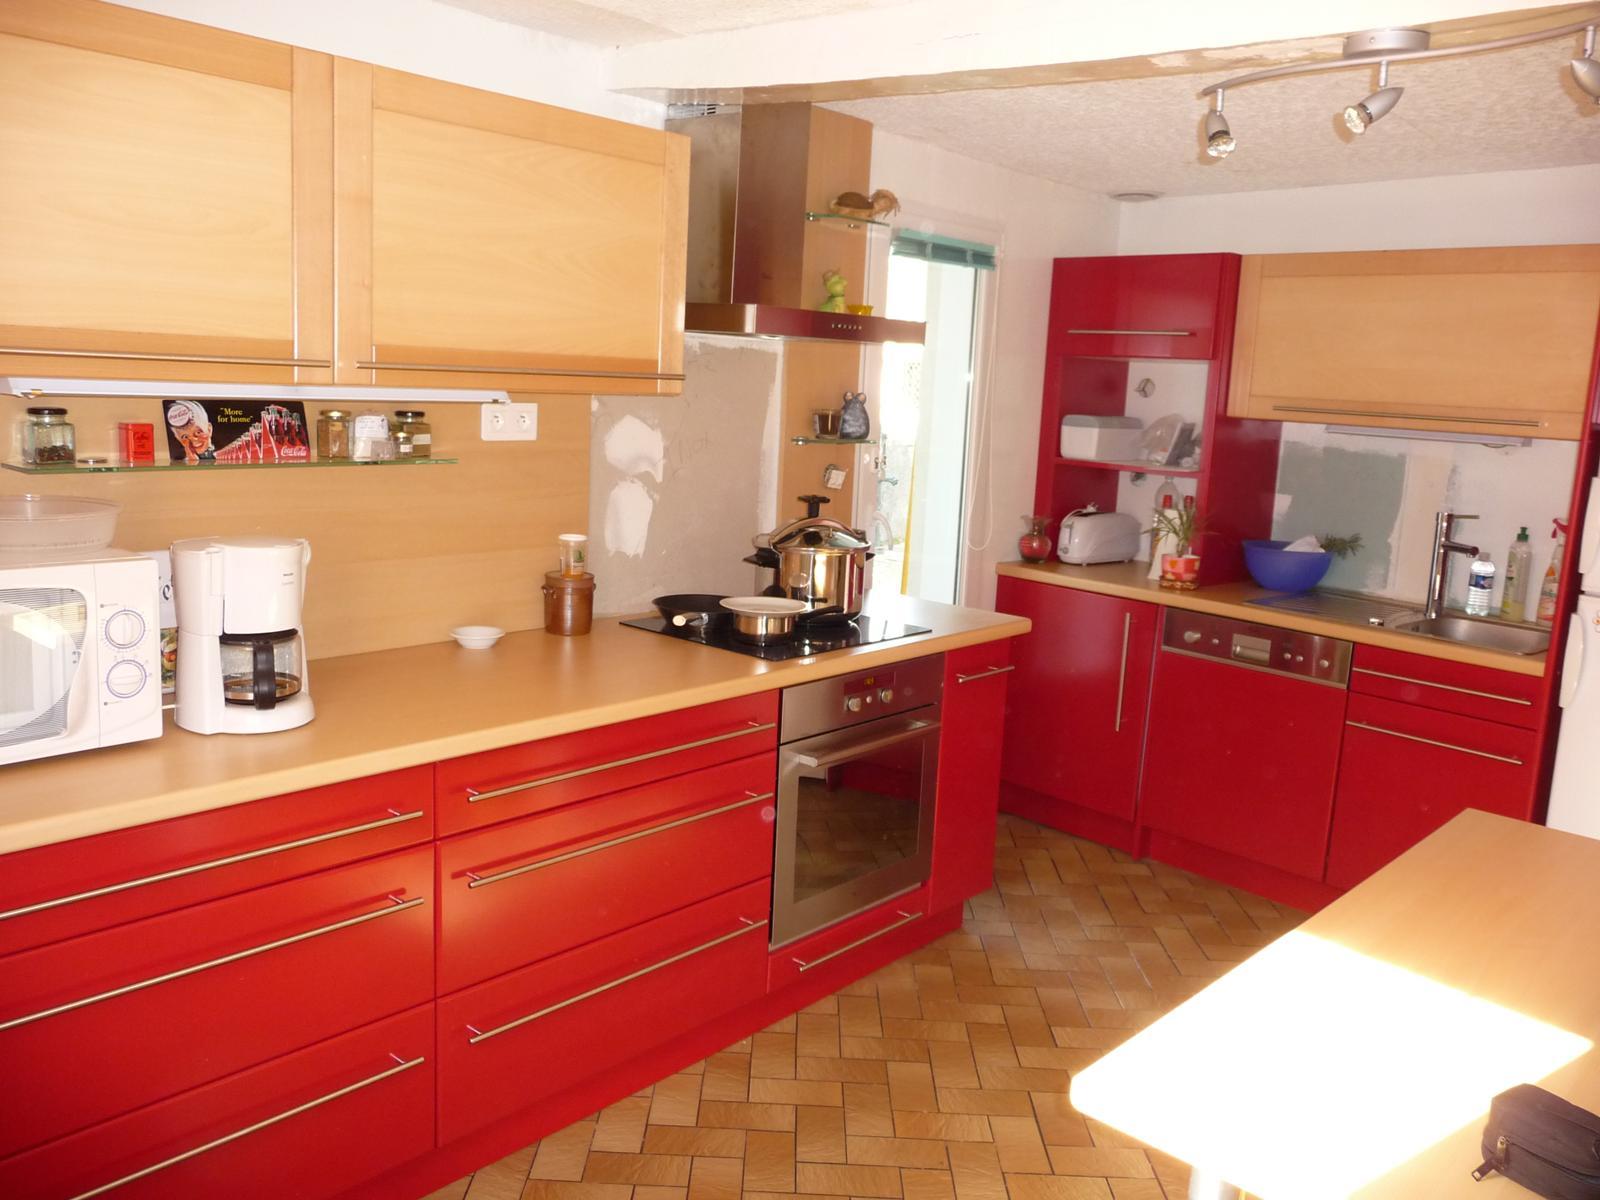 cuisine laqu e rouge menuiserie eb nisterie teddy gandolfi. Black Bedroom Furniture Sets. Home Design Ideas